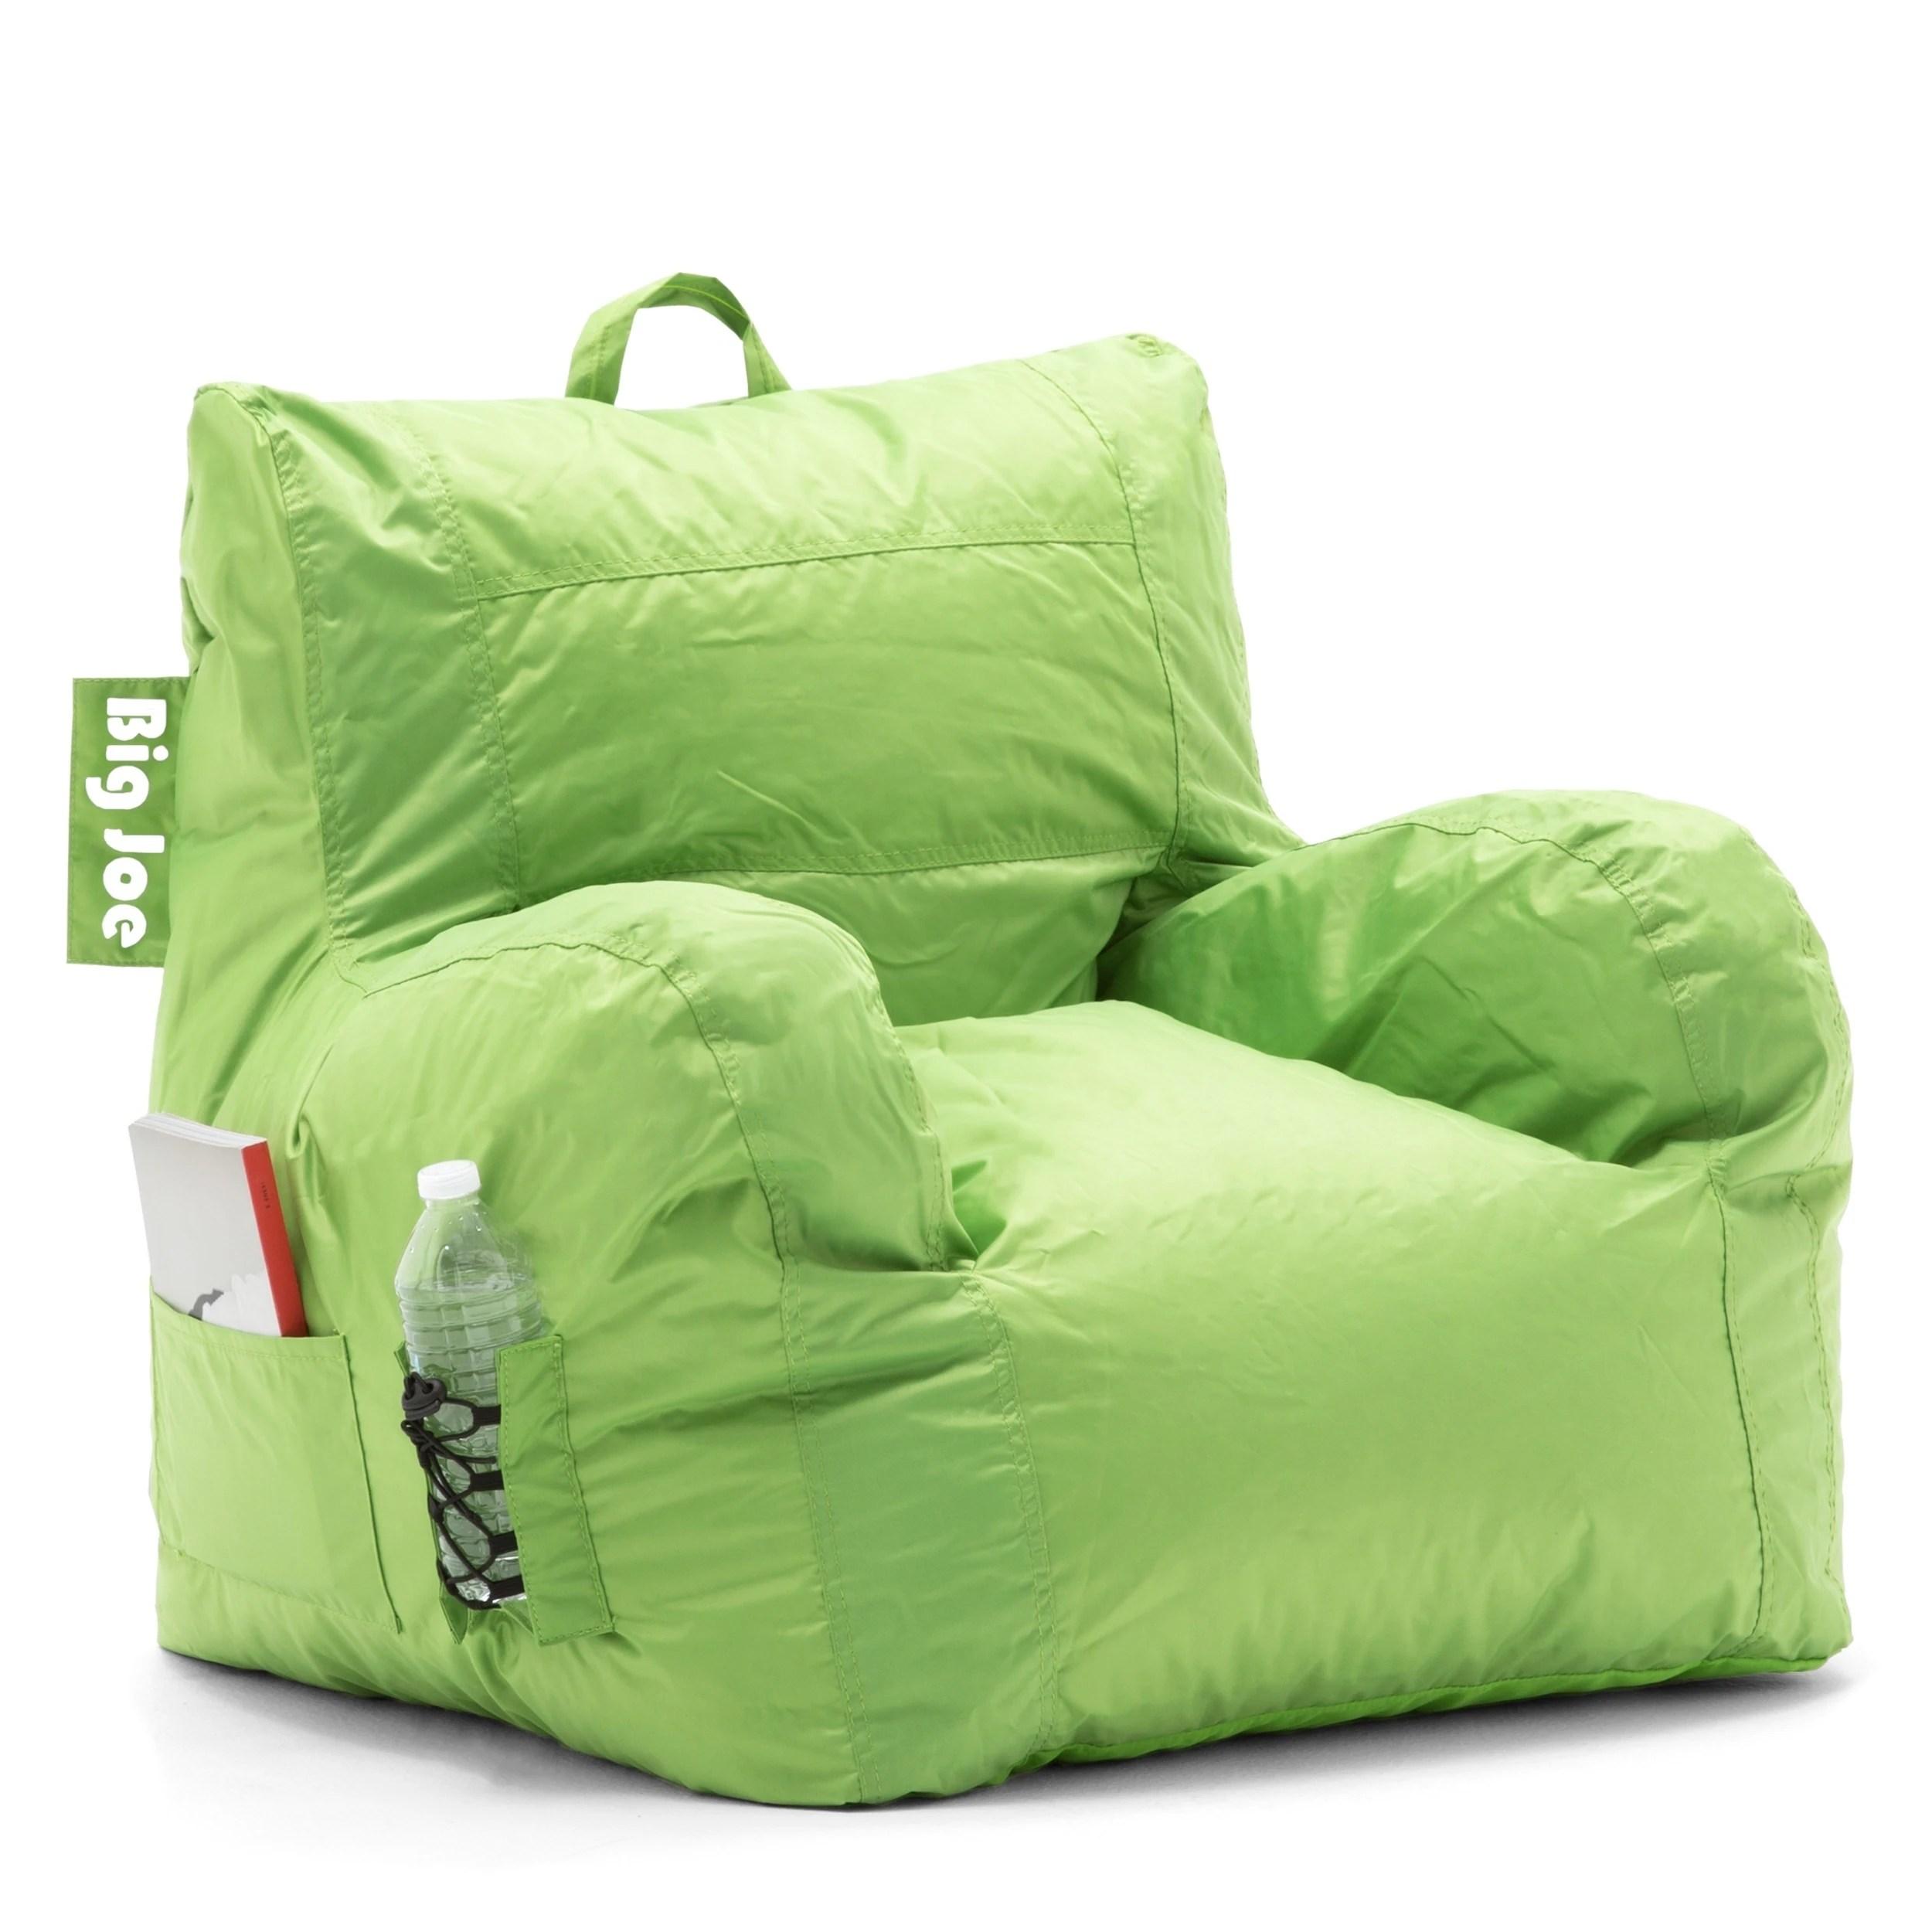 big joe bean bag chair stickley bow arm morris plans shop dorm free shipping today overstock com 18249680